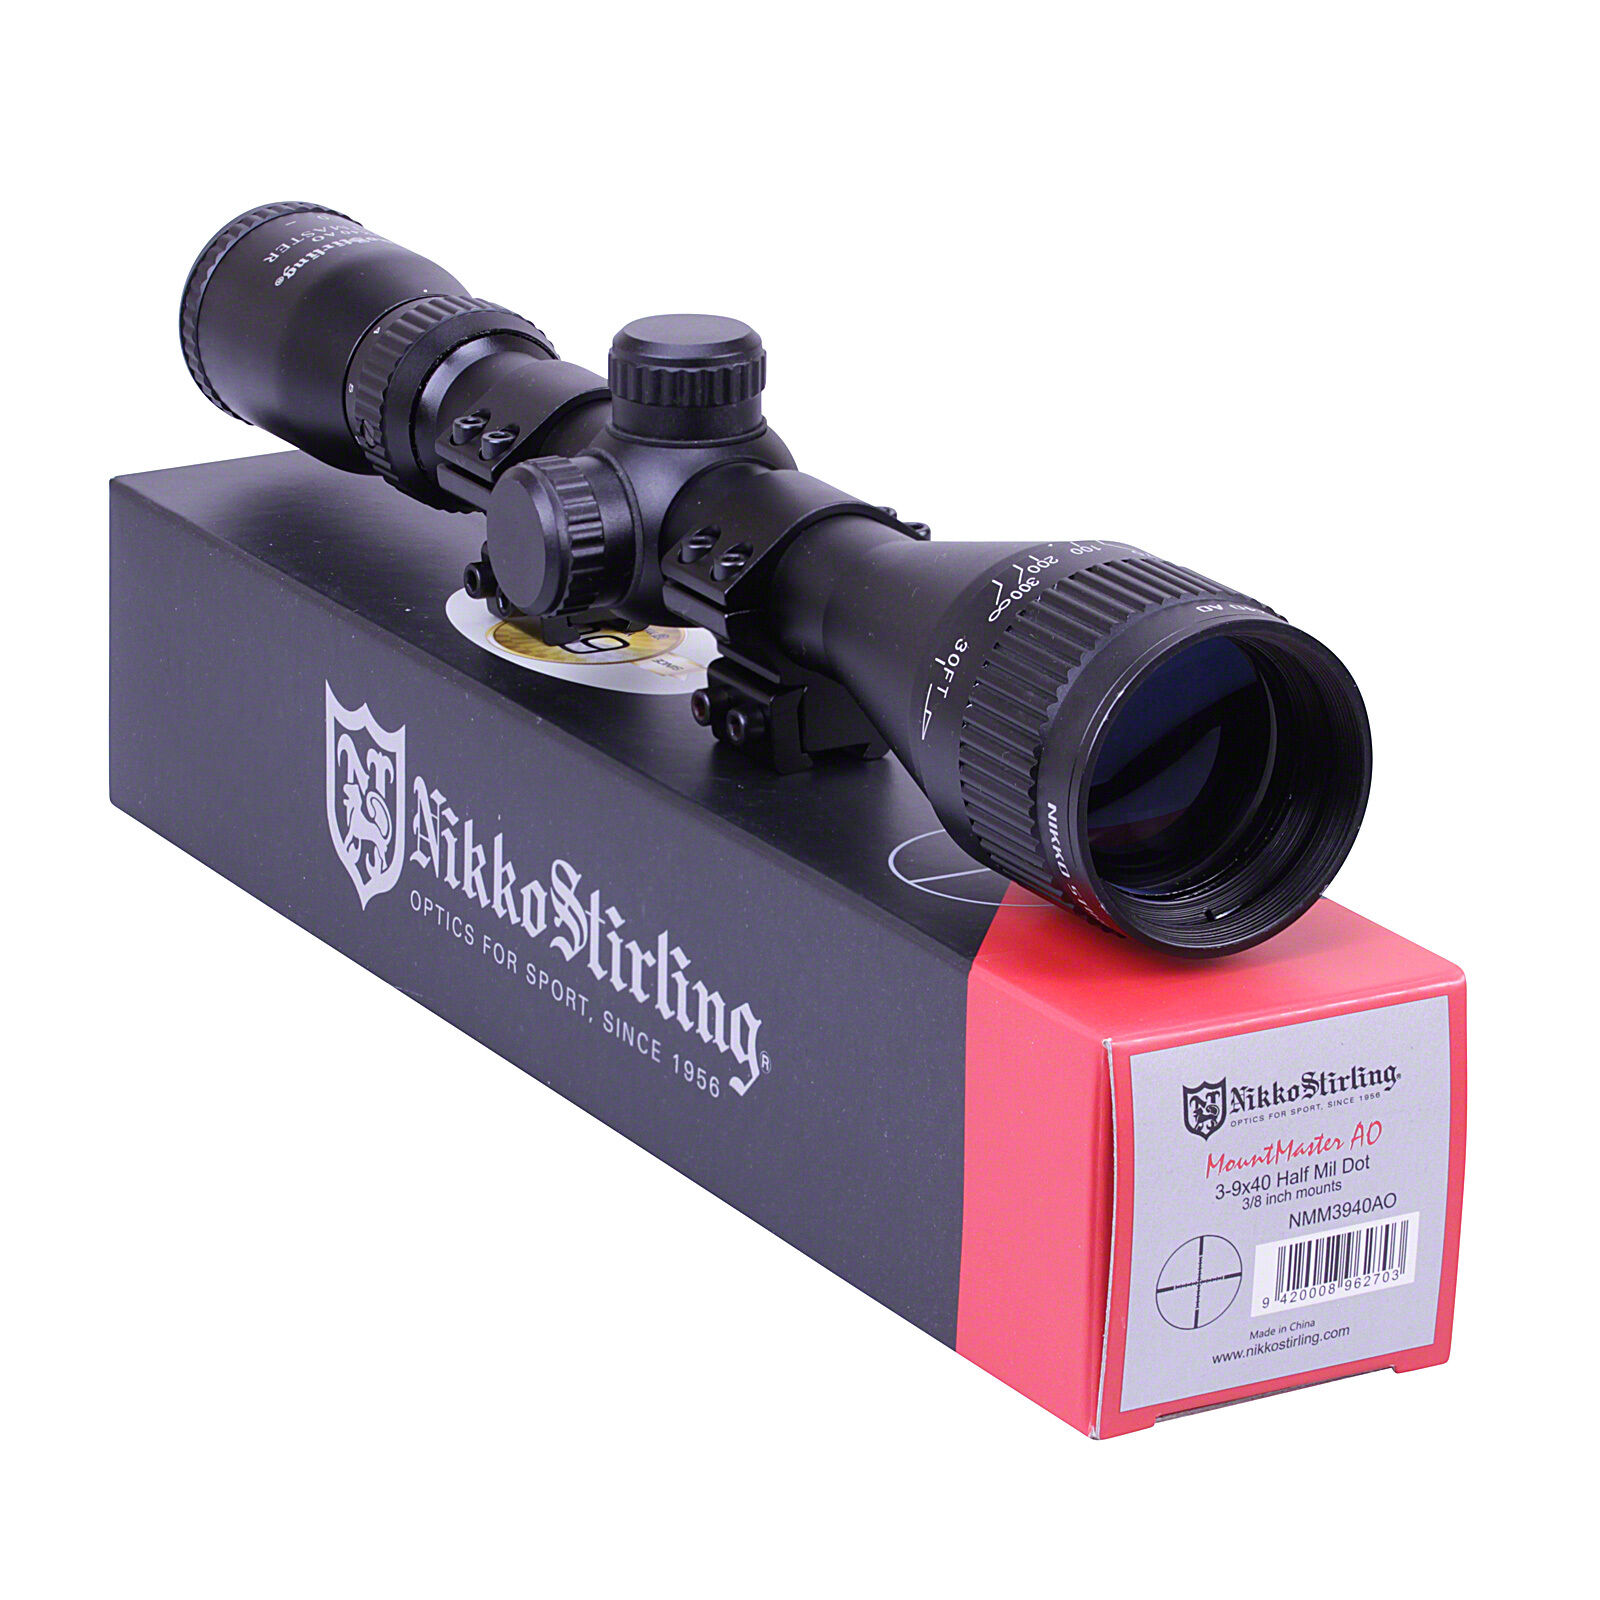 Nikko MOUNTMASTER 3-9x40 PX AO Parallax Zoom Rifle SCOPE Sight +3 8 11mm MOUNTS